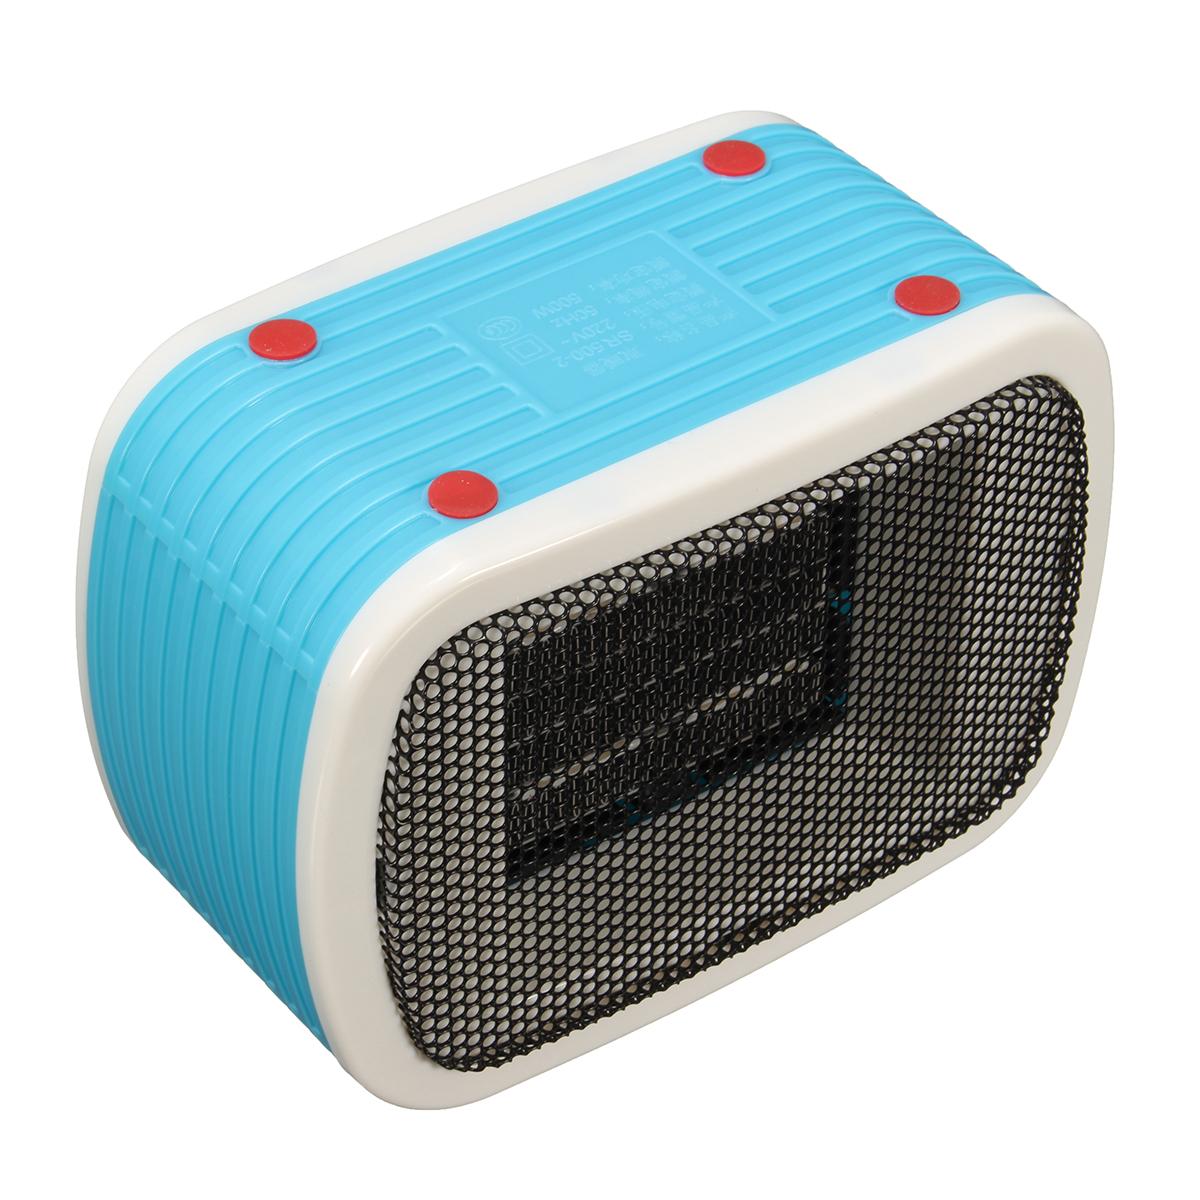 220v 500w mini chauffage radiateur electrique 3000rpm. Black Bedroom Furniture Sets. Home Design Ideas